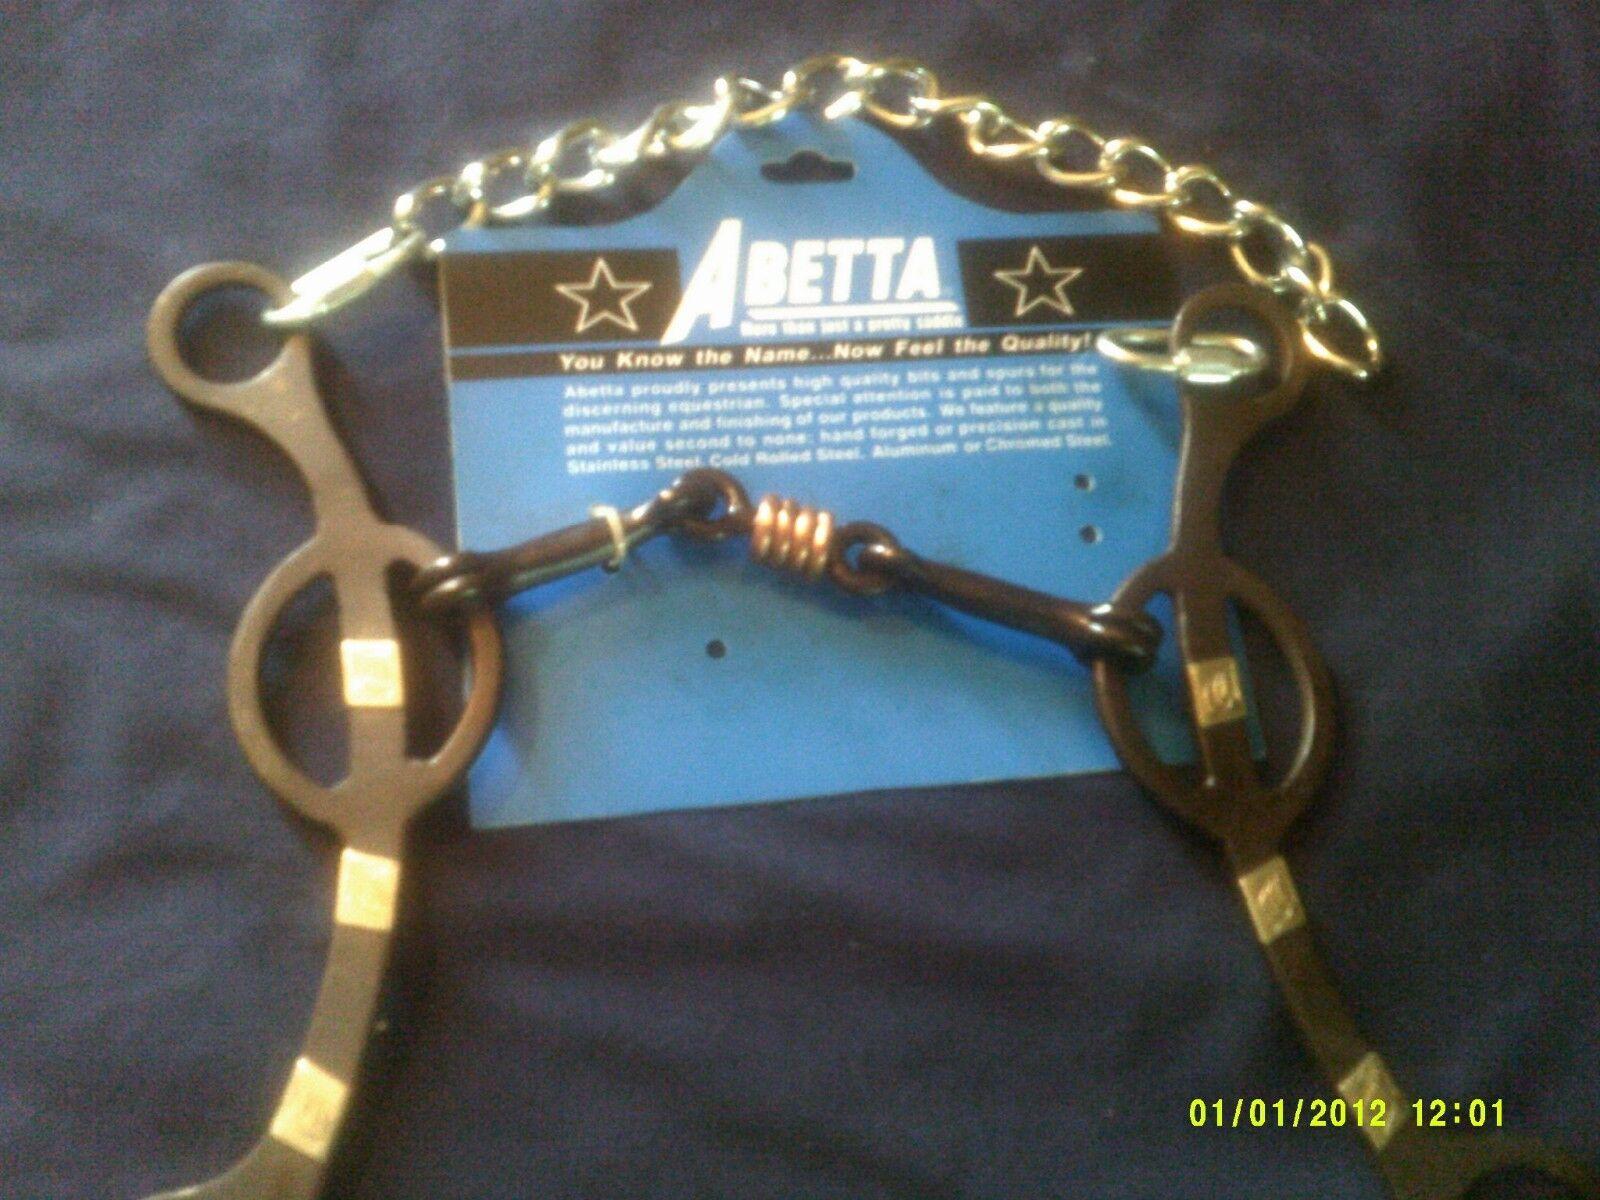 Bit Abetta 3 Piece With Copper Twisted Dog Bone Mouth 5 1/4\